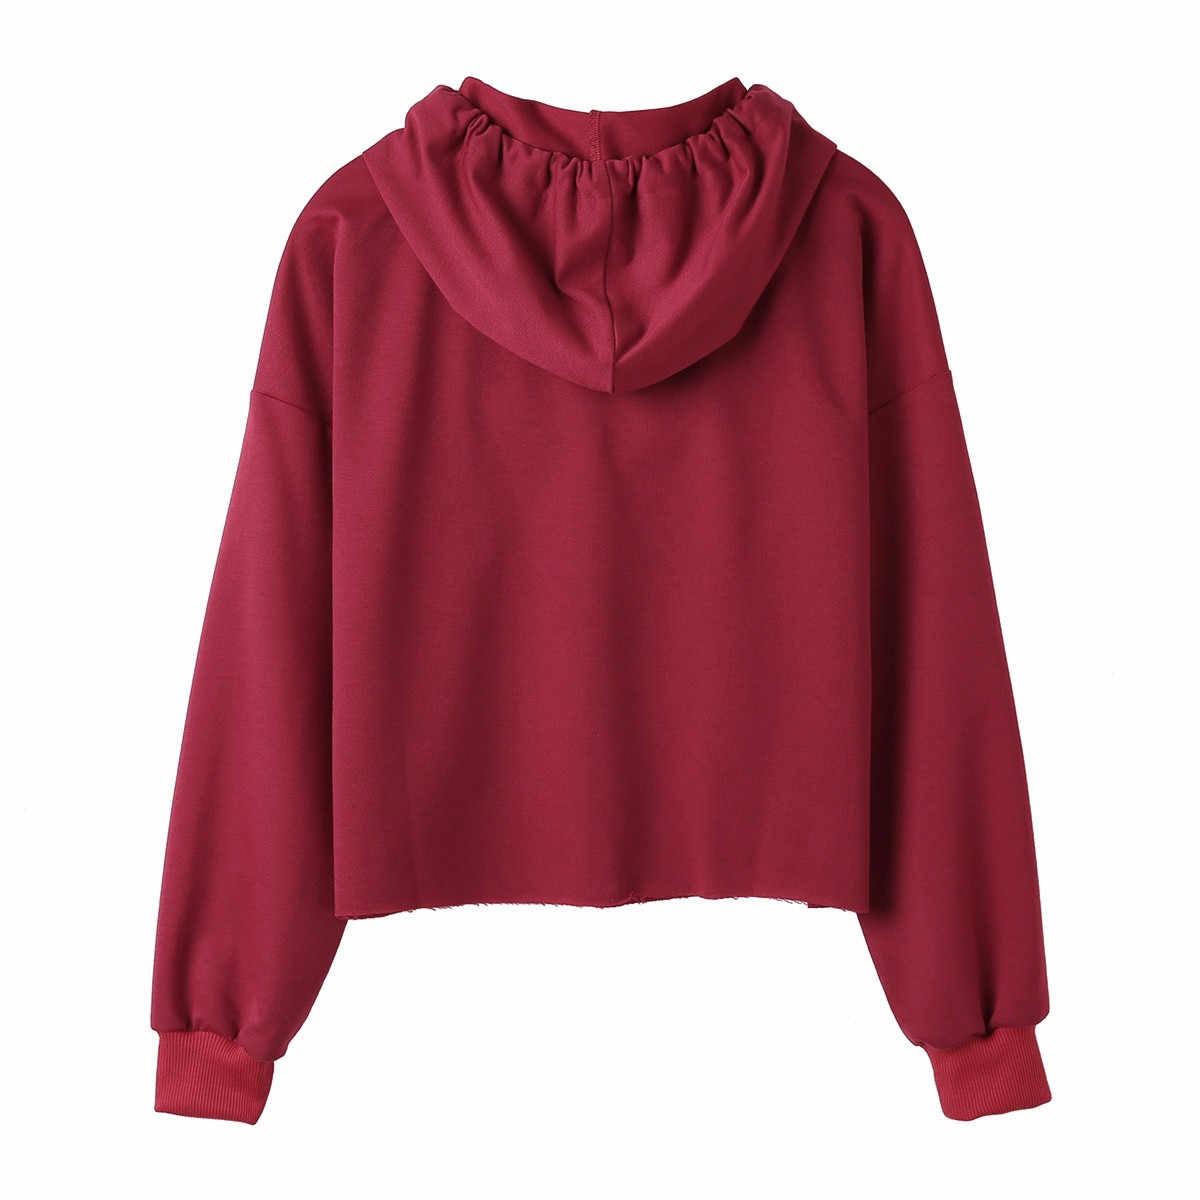 Kpop Hoodies Wanita Kucing Gambar Lengan Panjang Sweatshirt Pullover Warna Solid Musim Gugur Streetwear Hip Hop Atasan Толстовка Женская